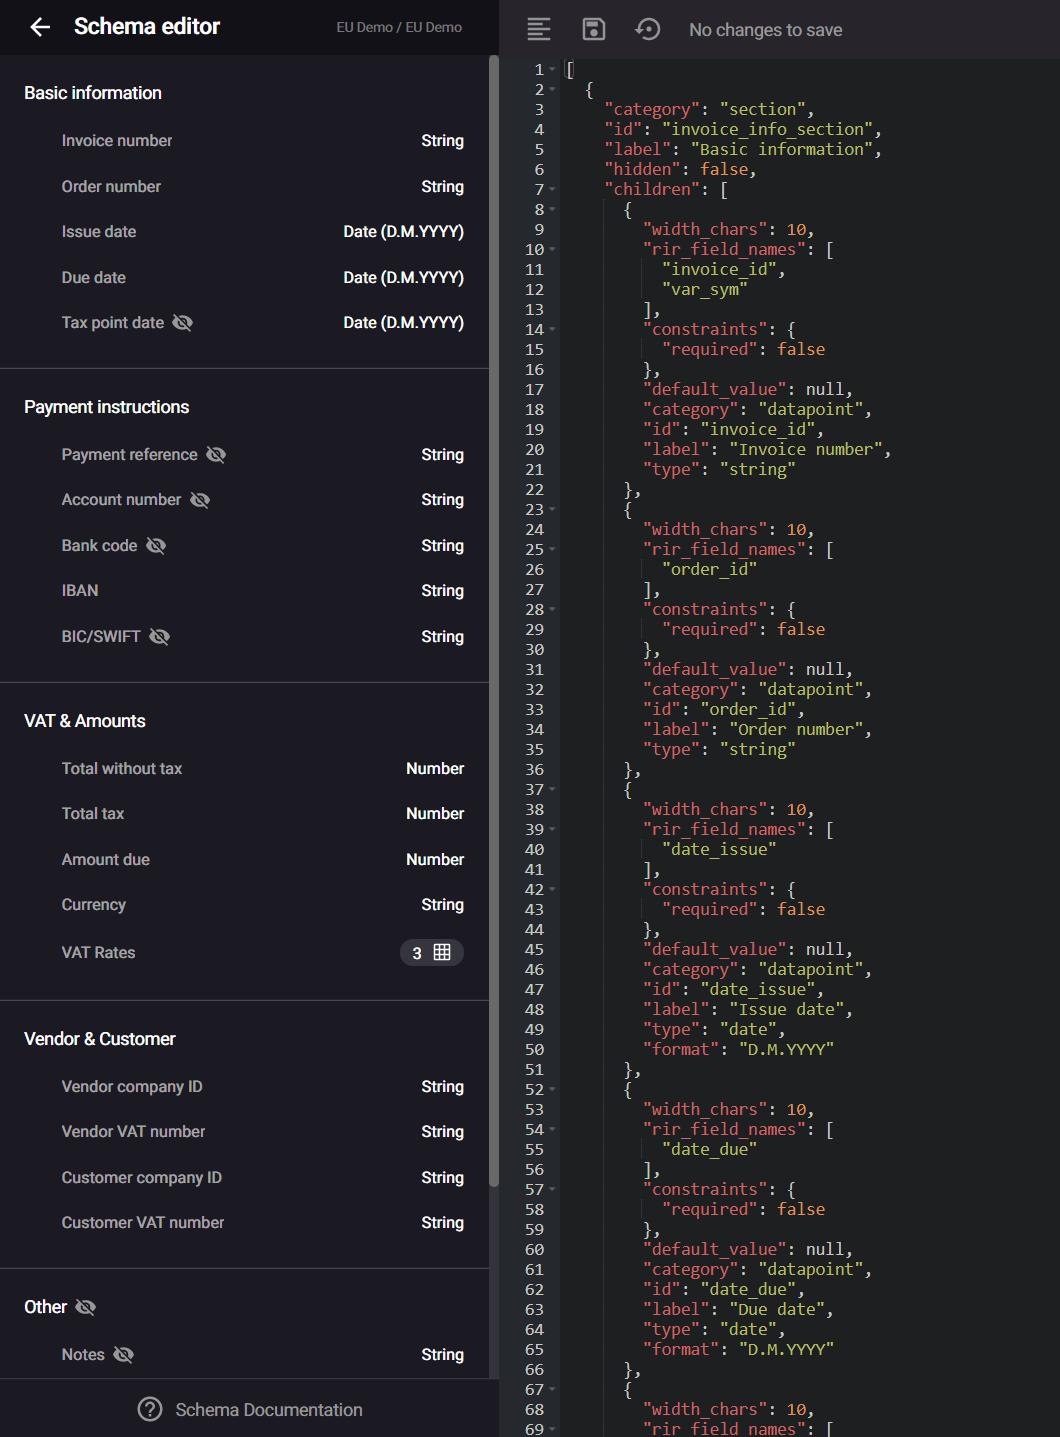 Exploring the schema editor